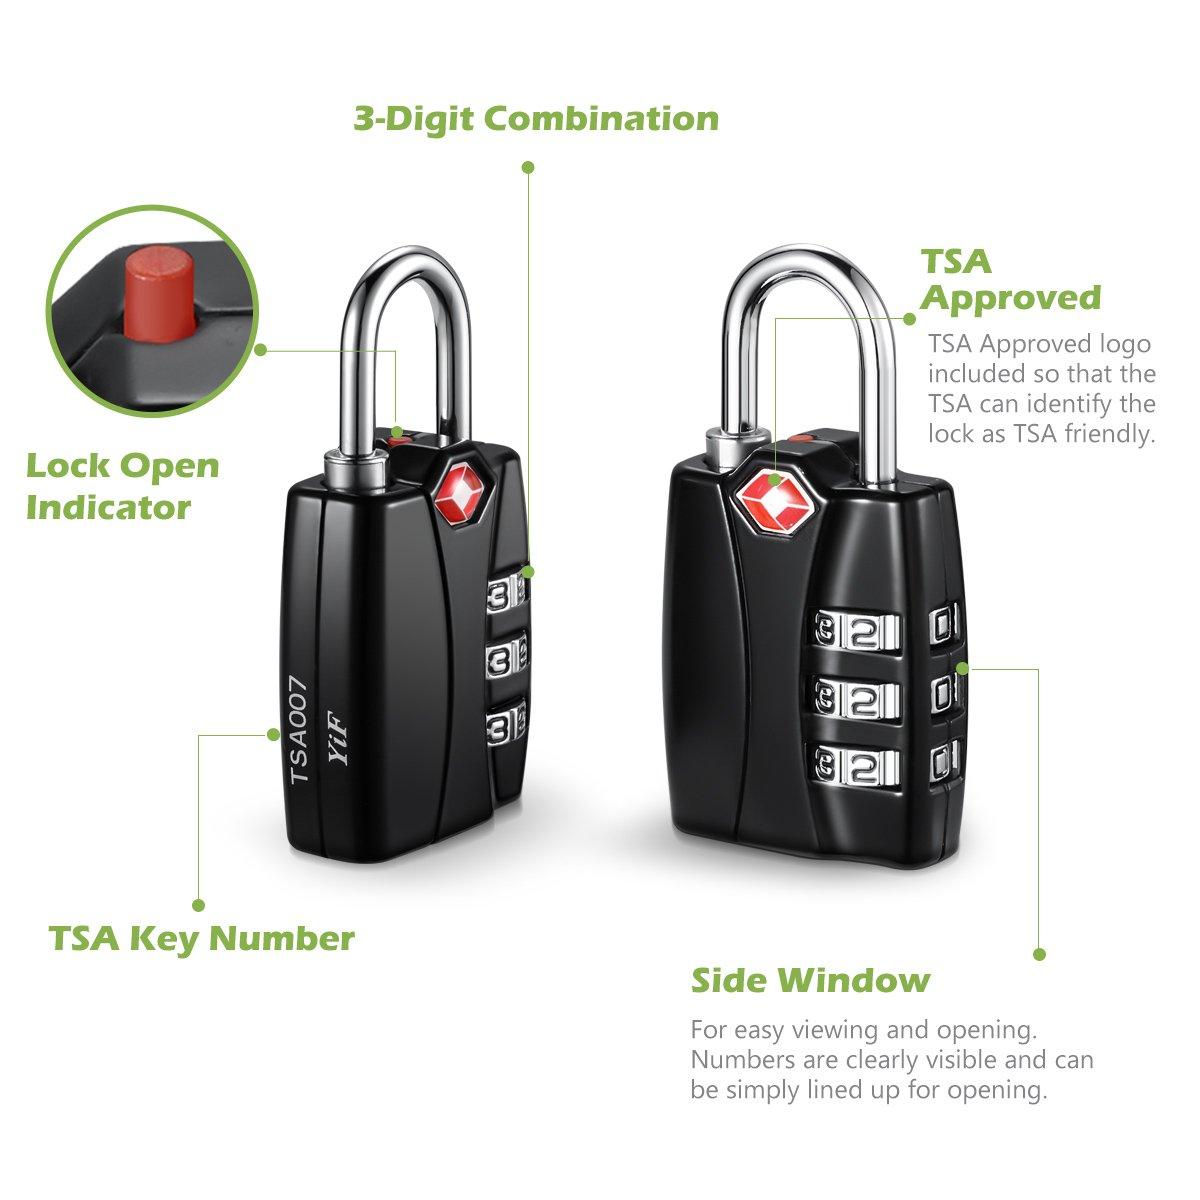 KeeKit Combination Locks, TSA Approved Luggage Locks with Open Alert Indicator, TSA Luggage Locks for Travel, Suitcase, Baggage & Backpack, Gym Locker (Black, 2 Pack) by KeeKit (Image #3)